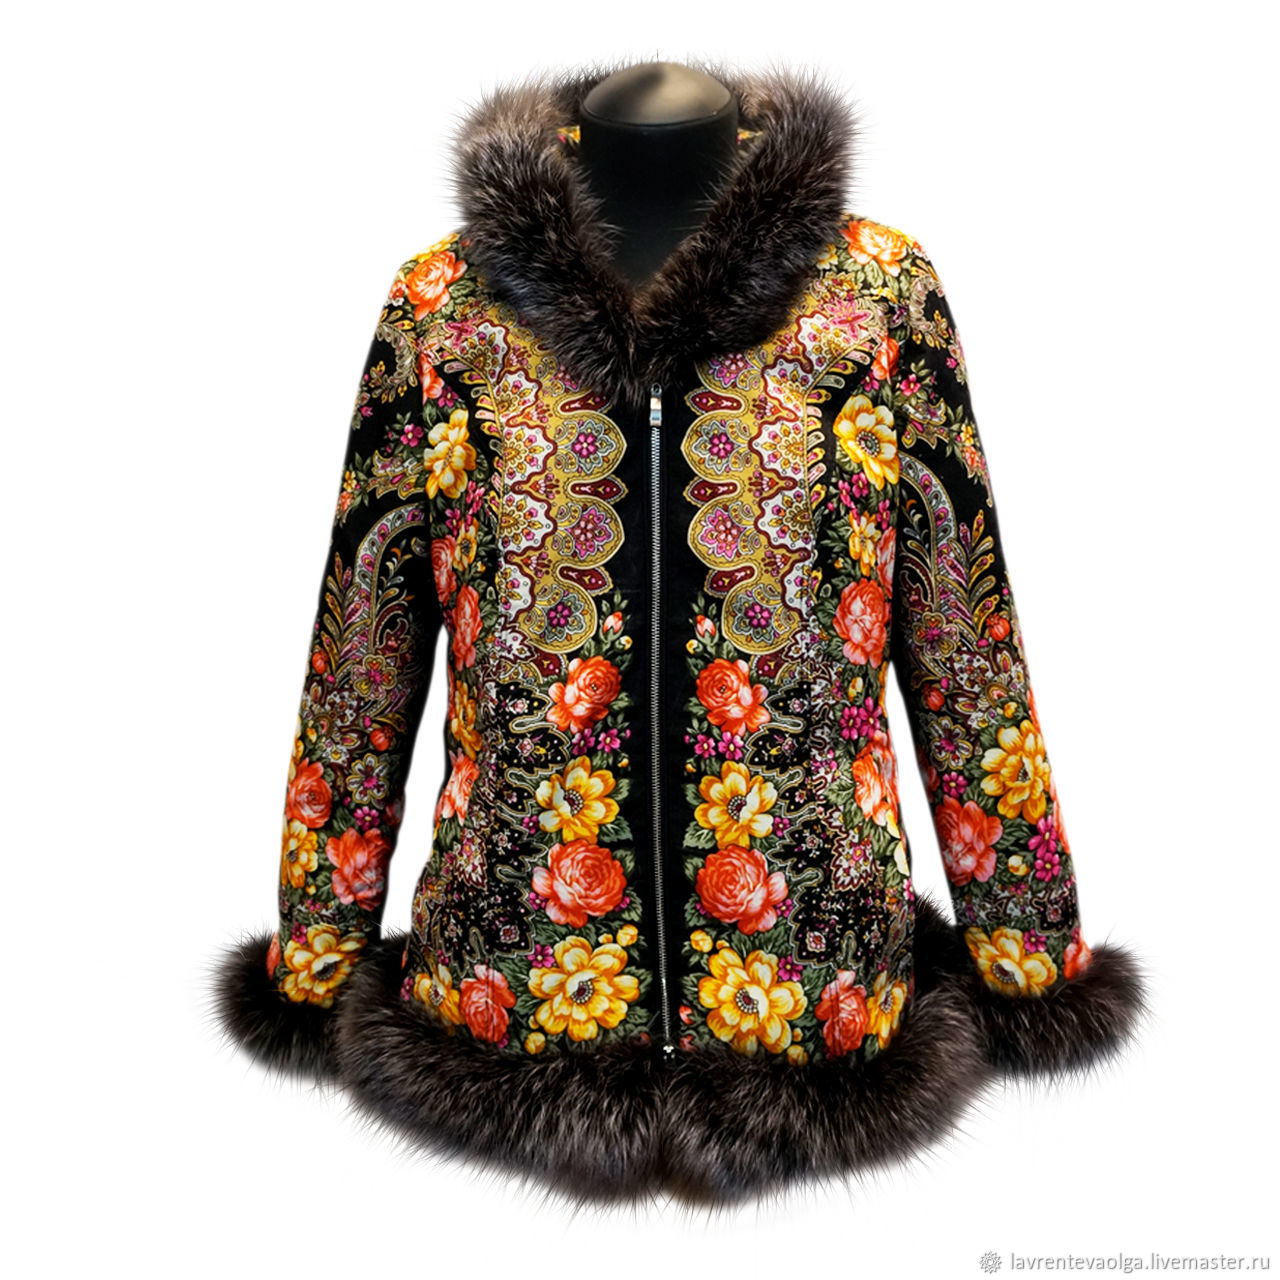 Jacket with fur of pavlovoposadskaja scarf, Outerwear Jackets, Moscow,  Фото №1